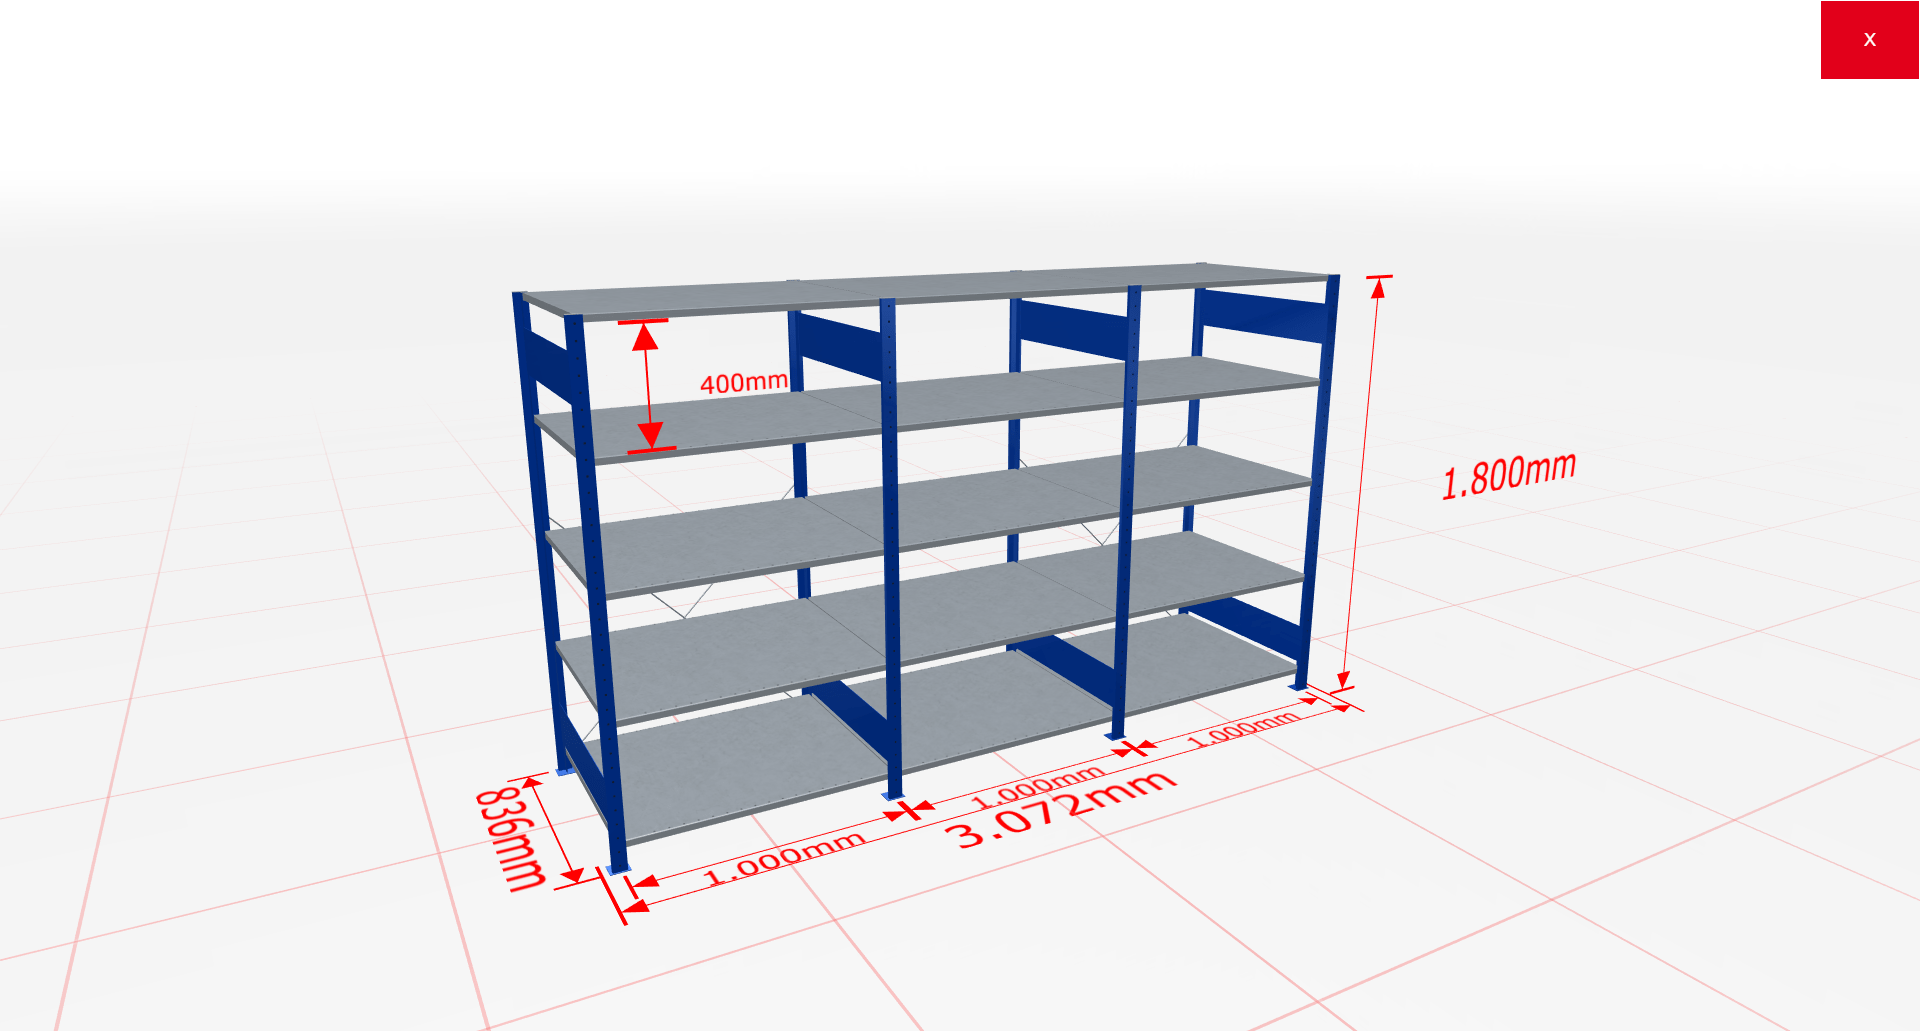 Fachbodenregal Komplettregal 1800x3072x800 mm (HxBxT) SCHULTE Lagertechnik blau 5 Ebenen  150 kg je Boden